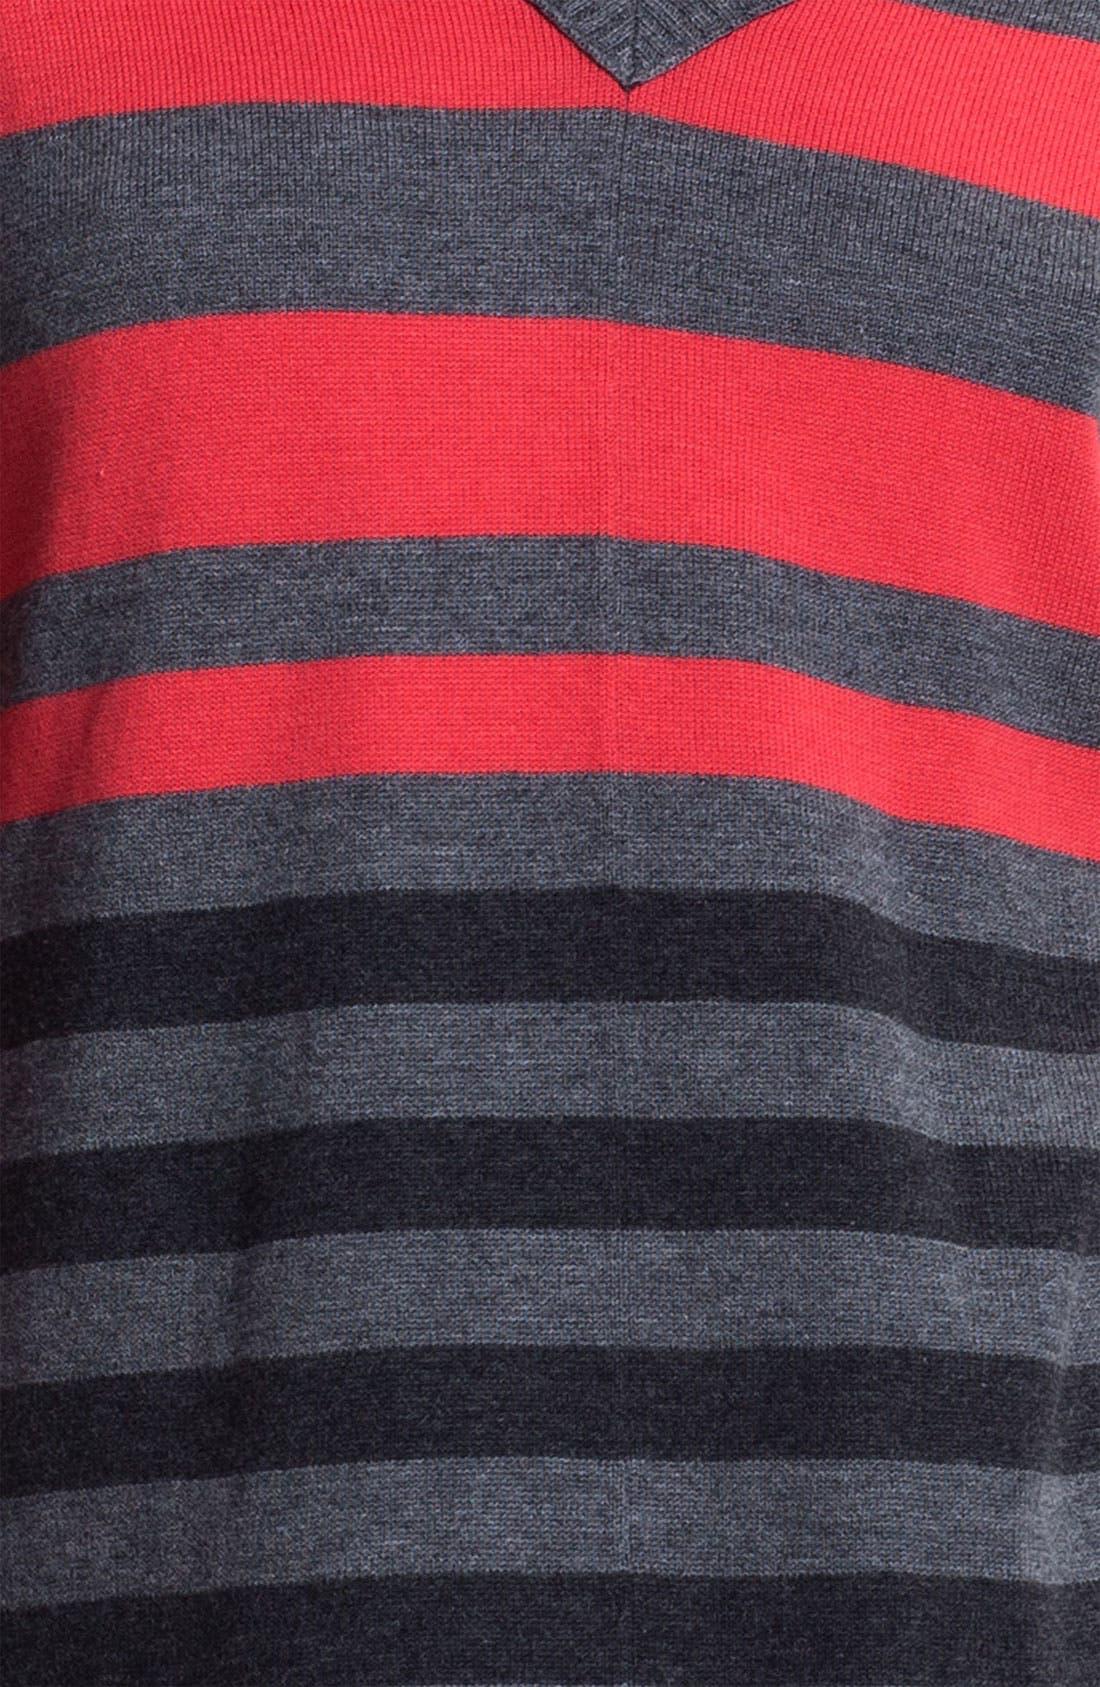 Alternate Image 3  - Caslon Double V-Neck Tunic Sweater (Petite)